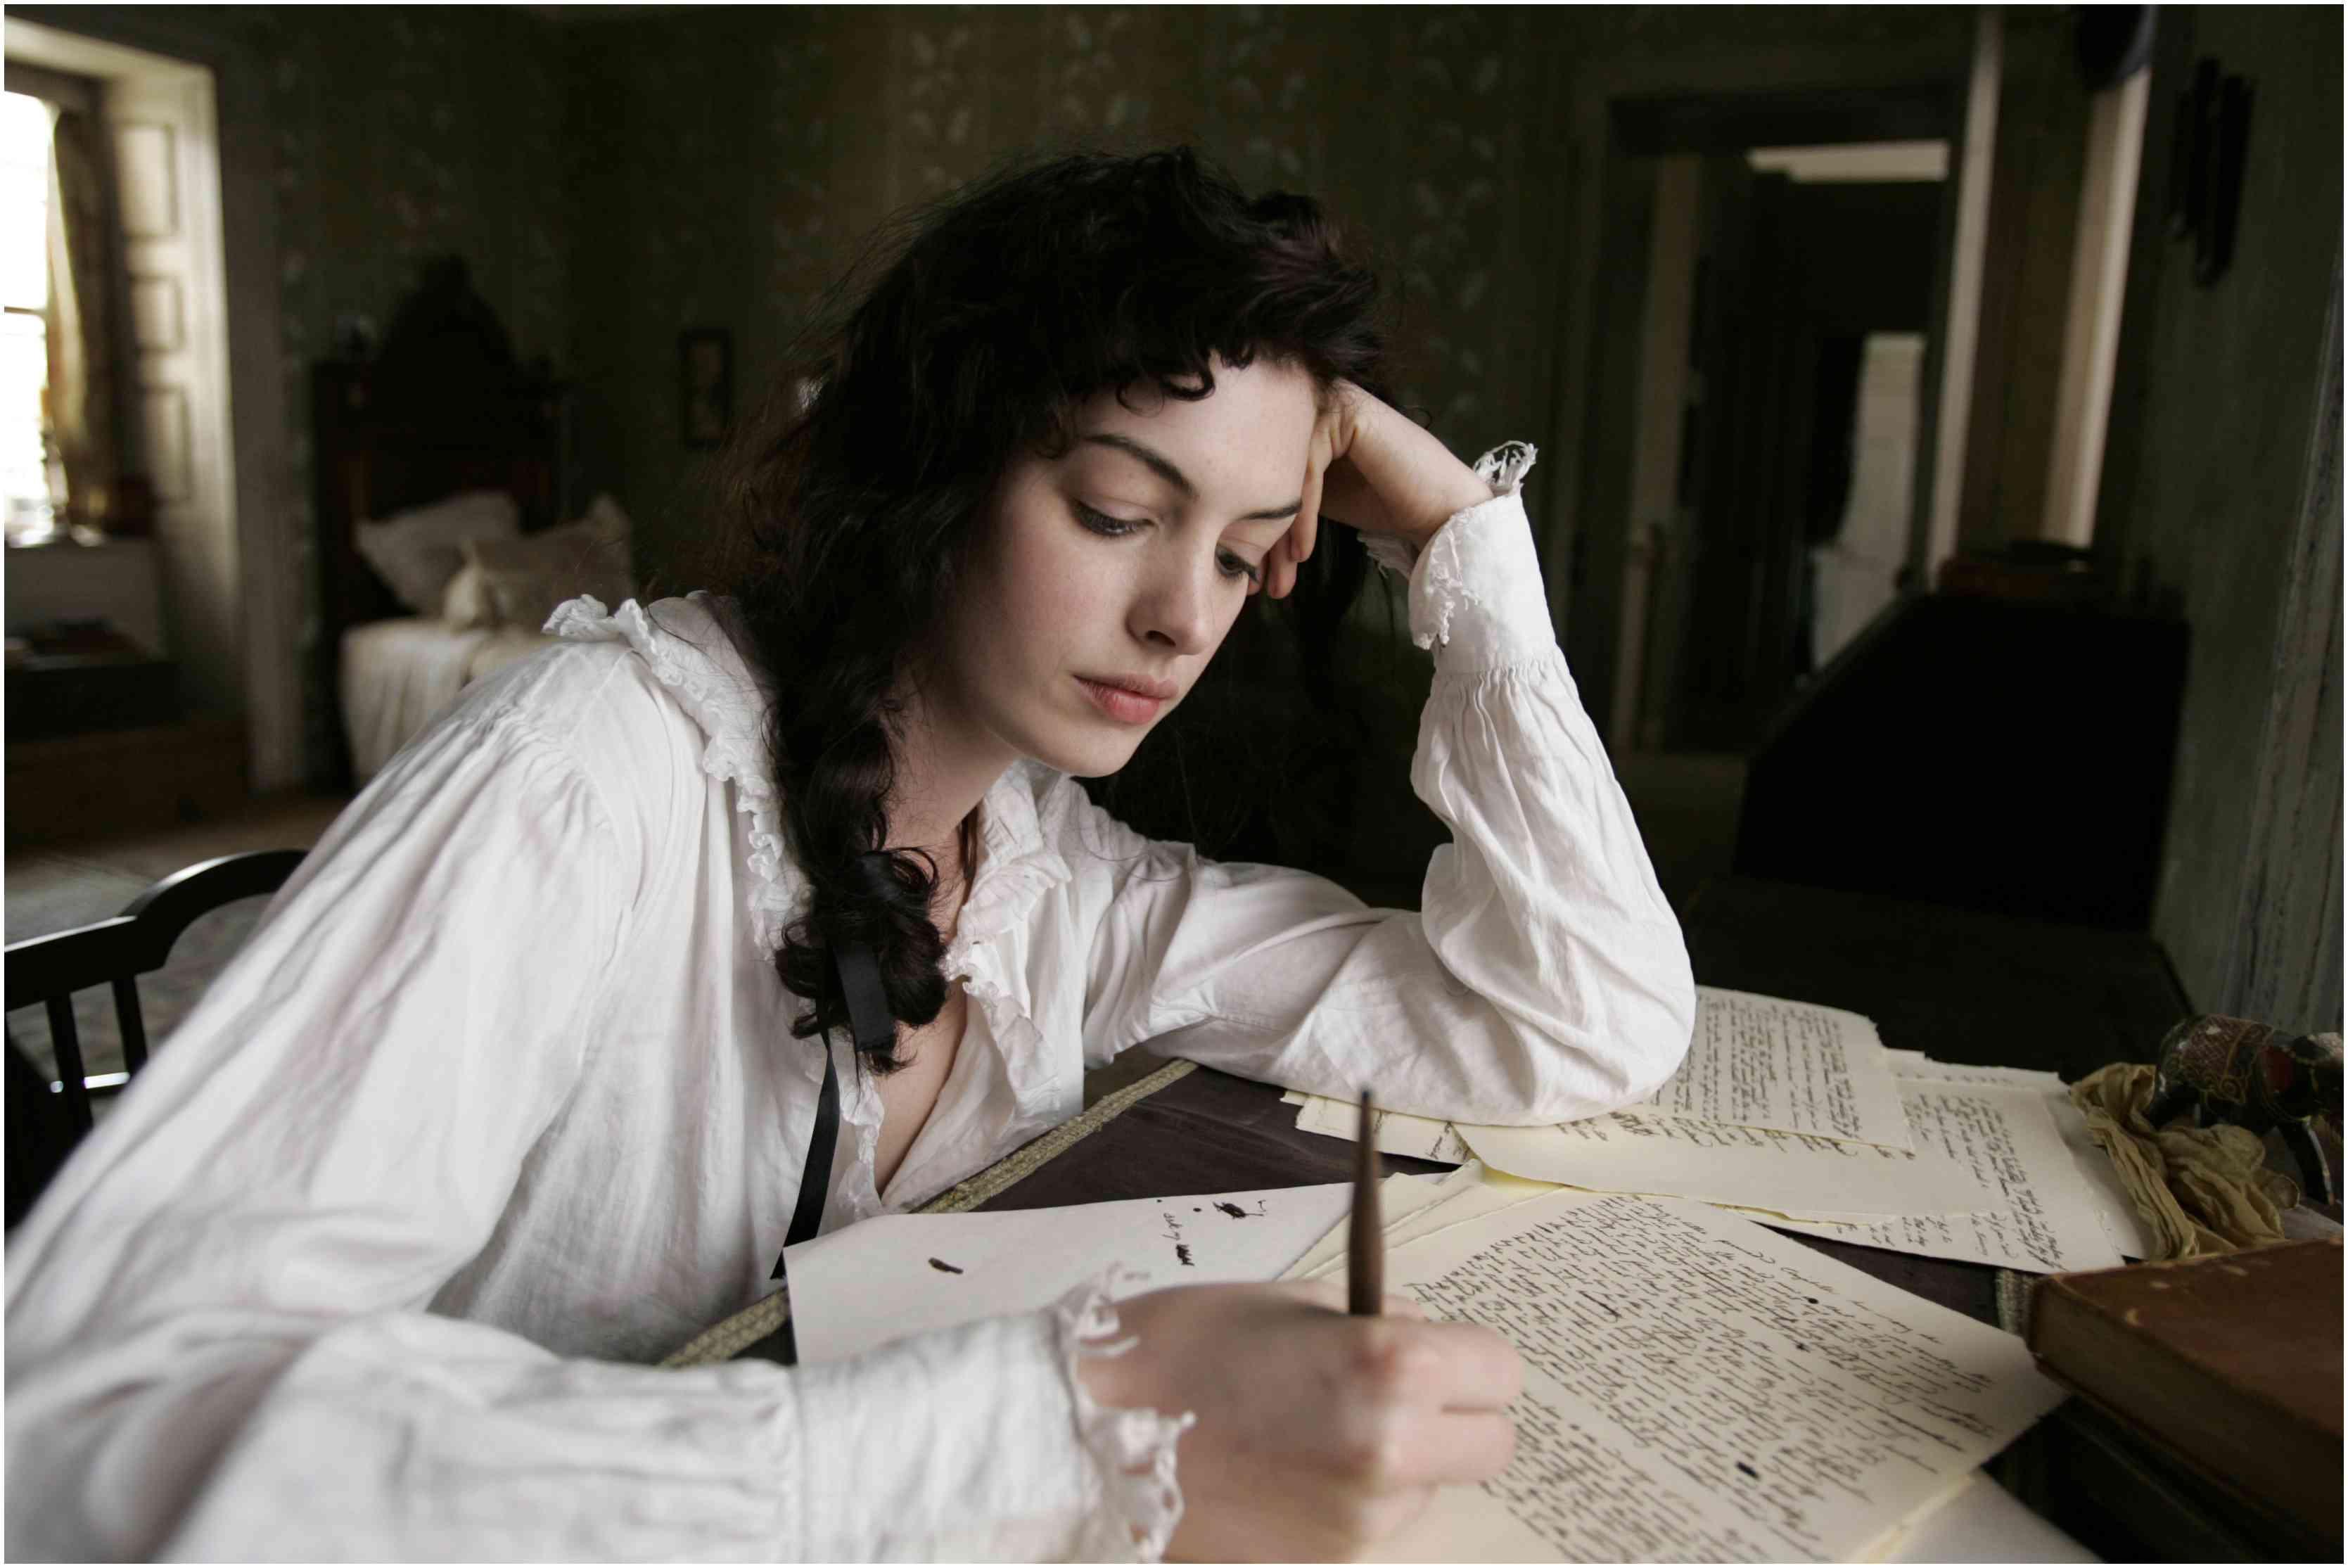 Frasi Matrimonio Jane Austen.Jane Austen Biografia Stile Citazioni Frasi Pensieri